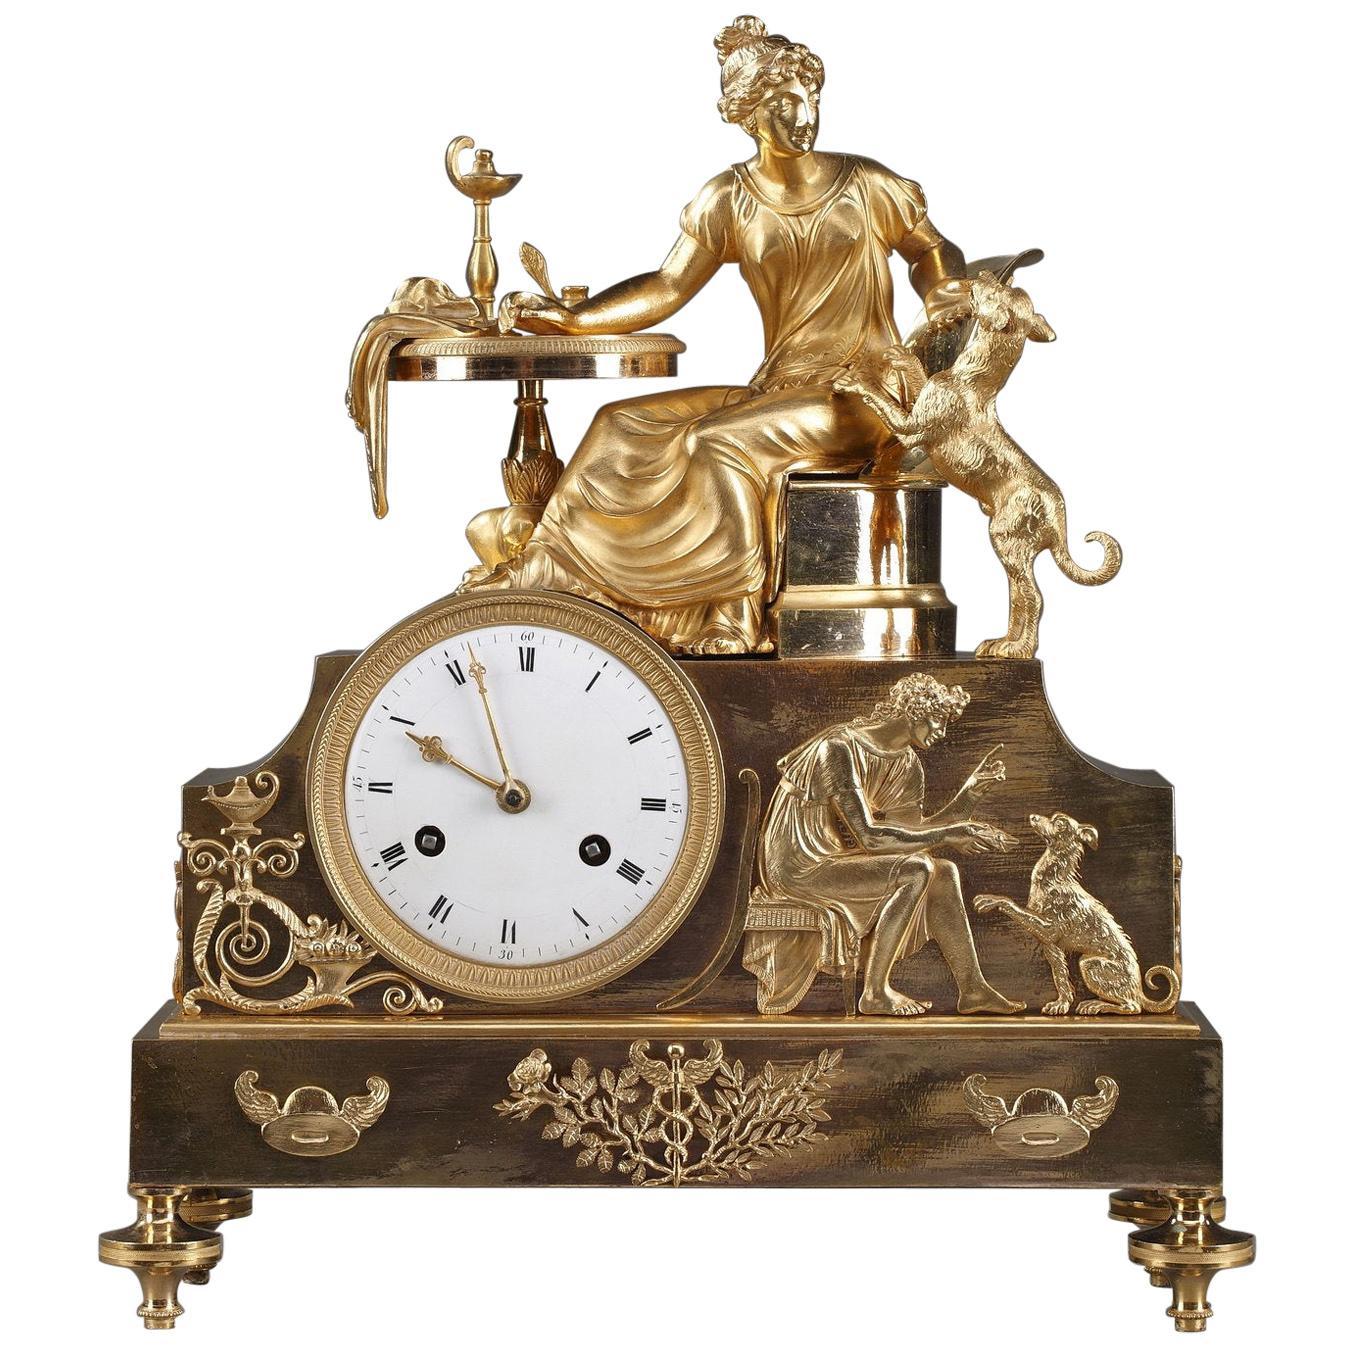 19th Century Empire Ormolu Mantel Clock, Fidelity